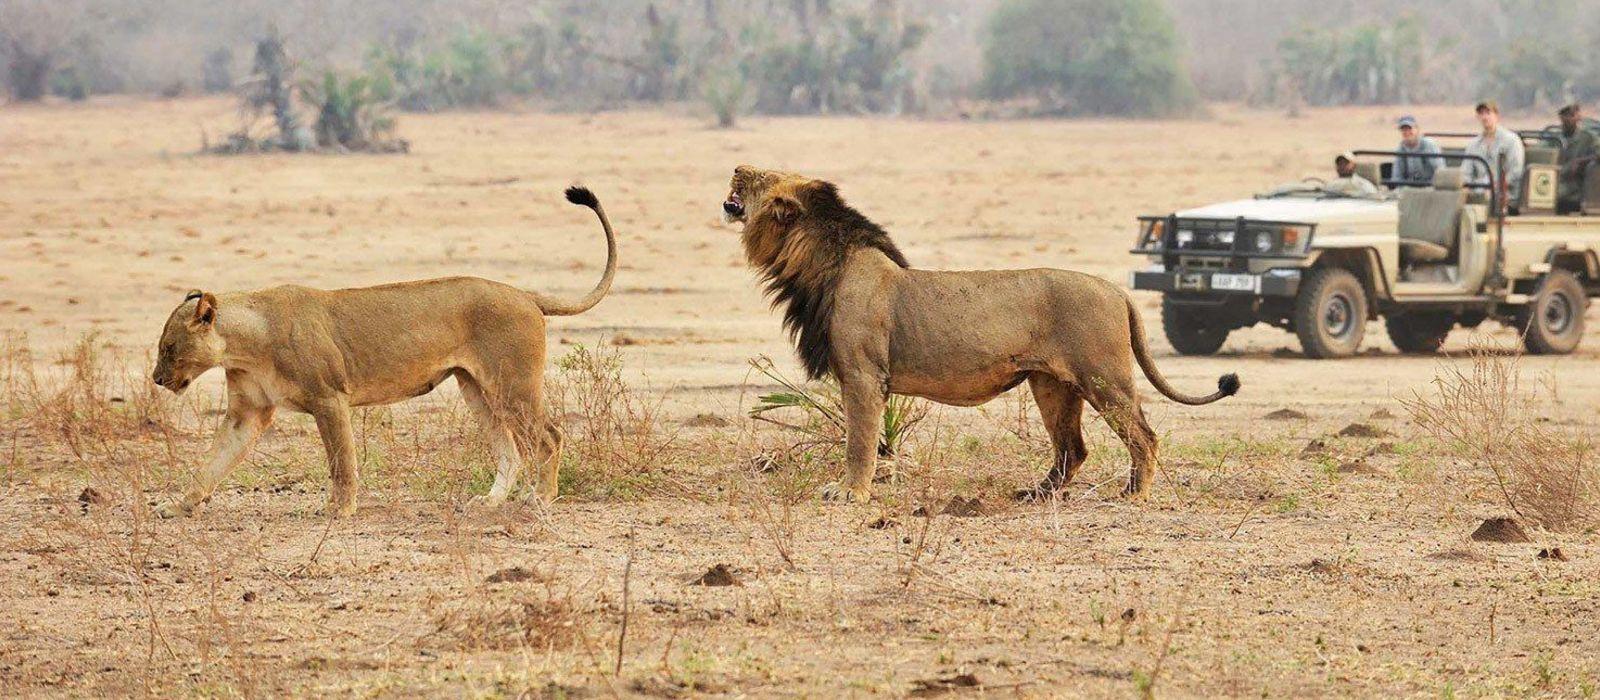 Tansania: Wahre Wildnis, unberührtes Juwel & Inselparadies Urlaub 3